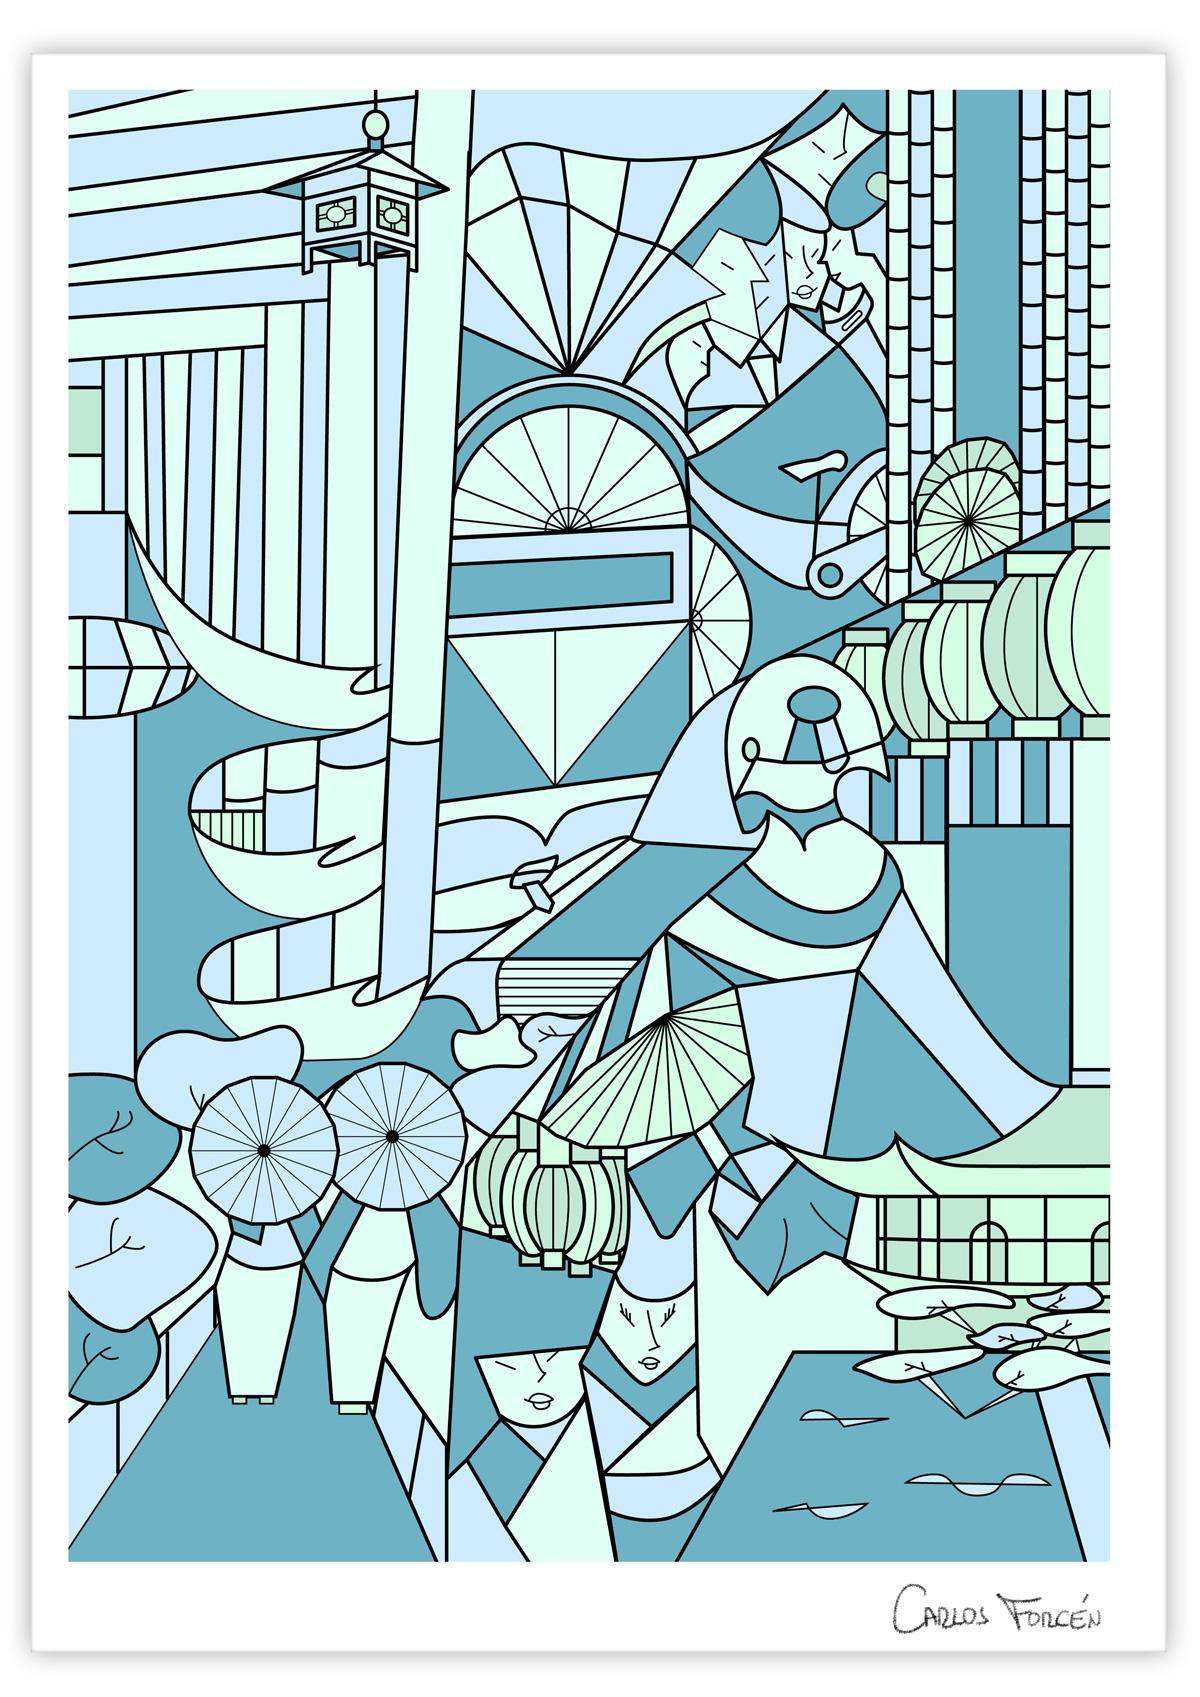 kioto-day_carlos-forcen_ilustracion_signed-01